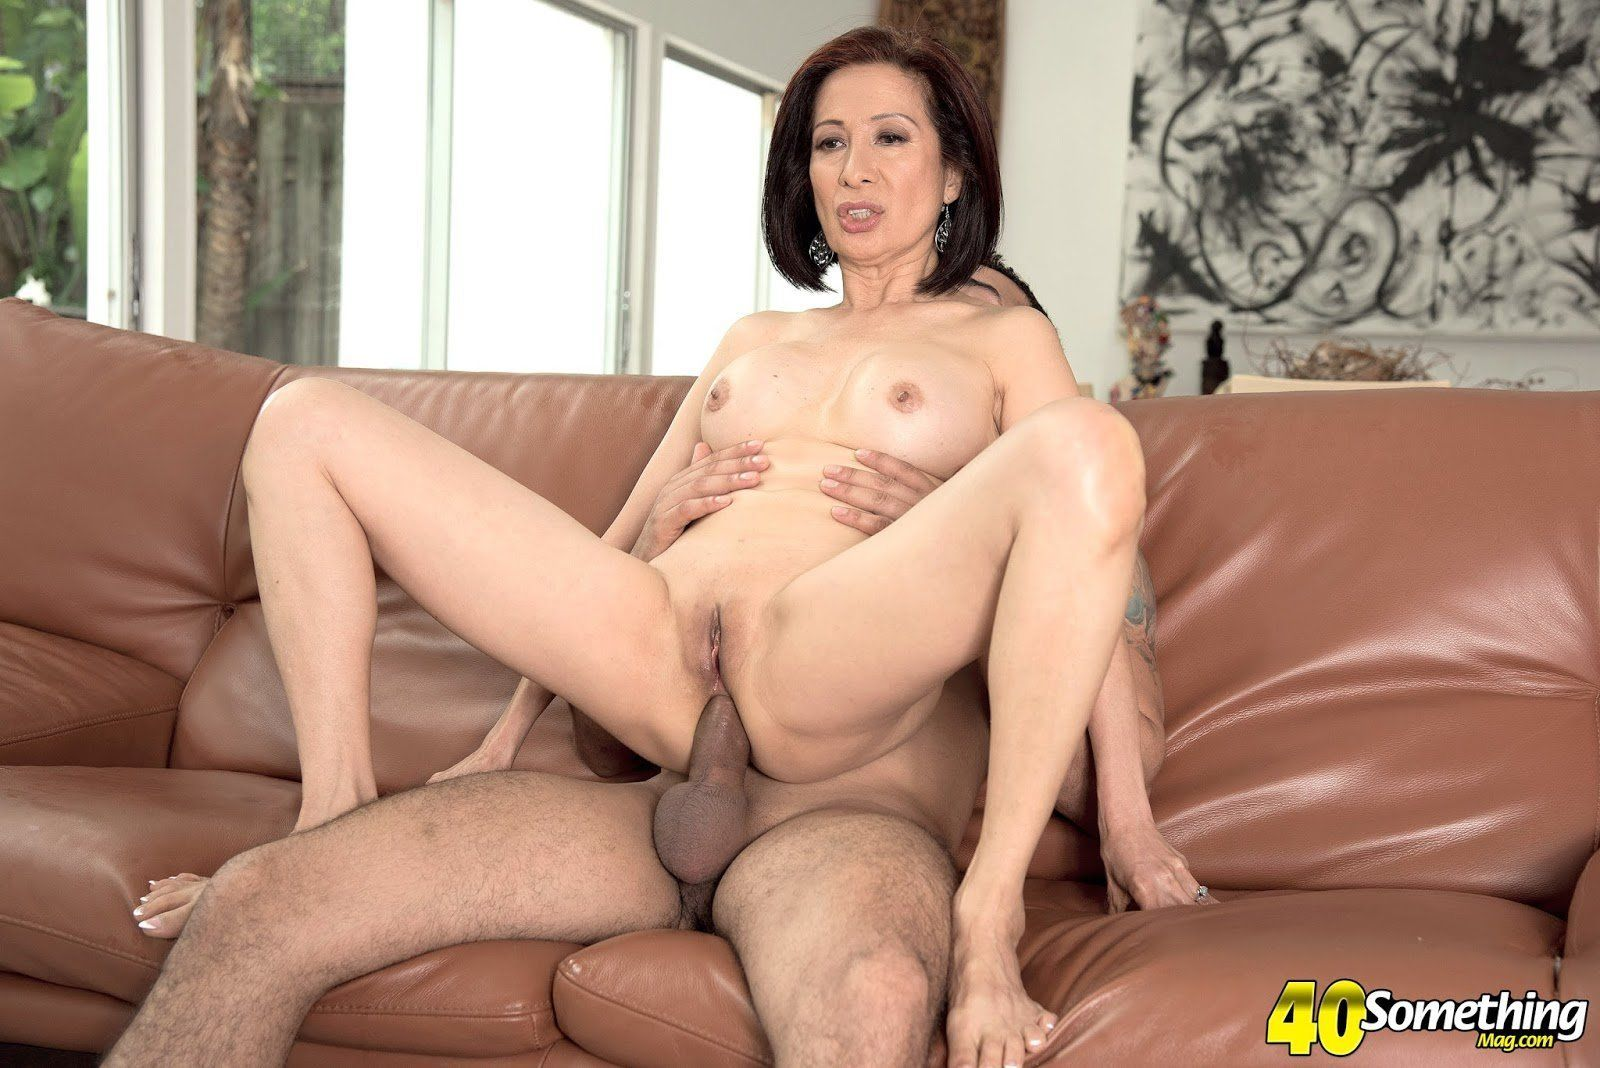 Mature asian anal porn